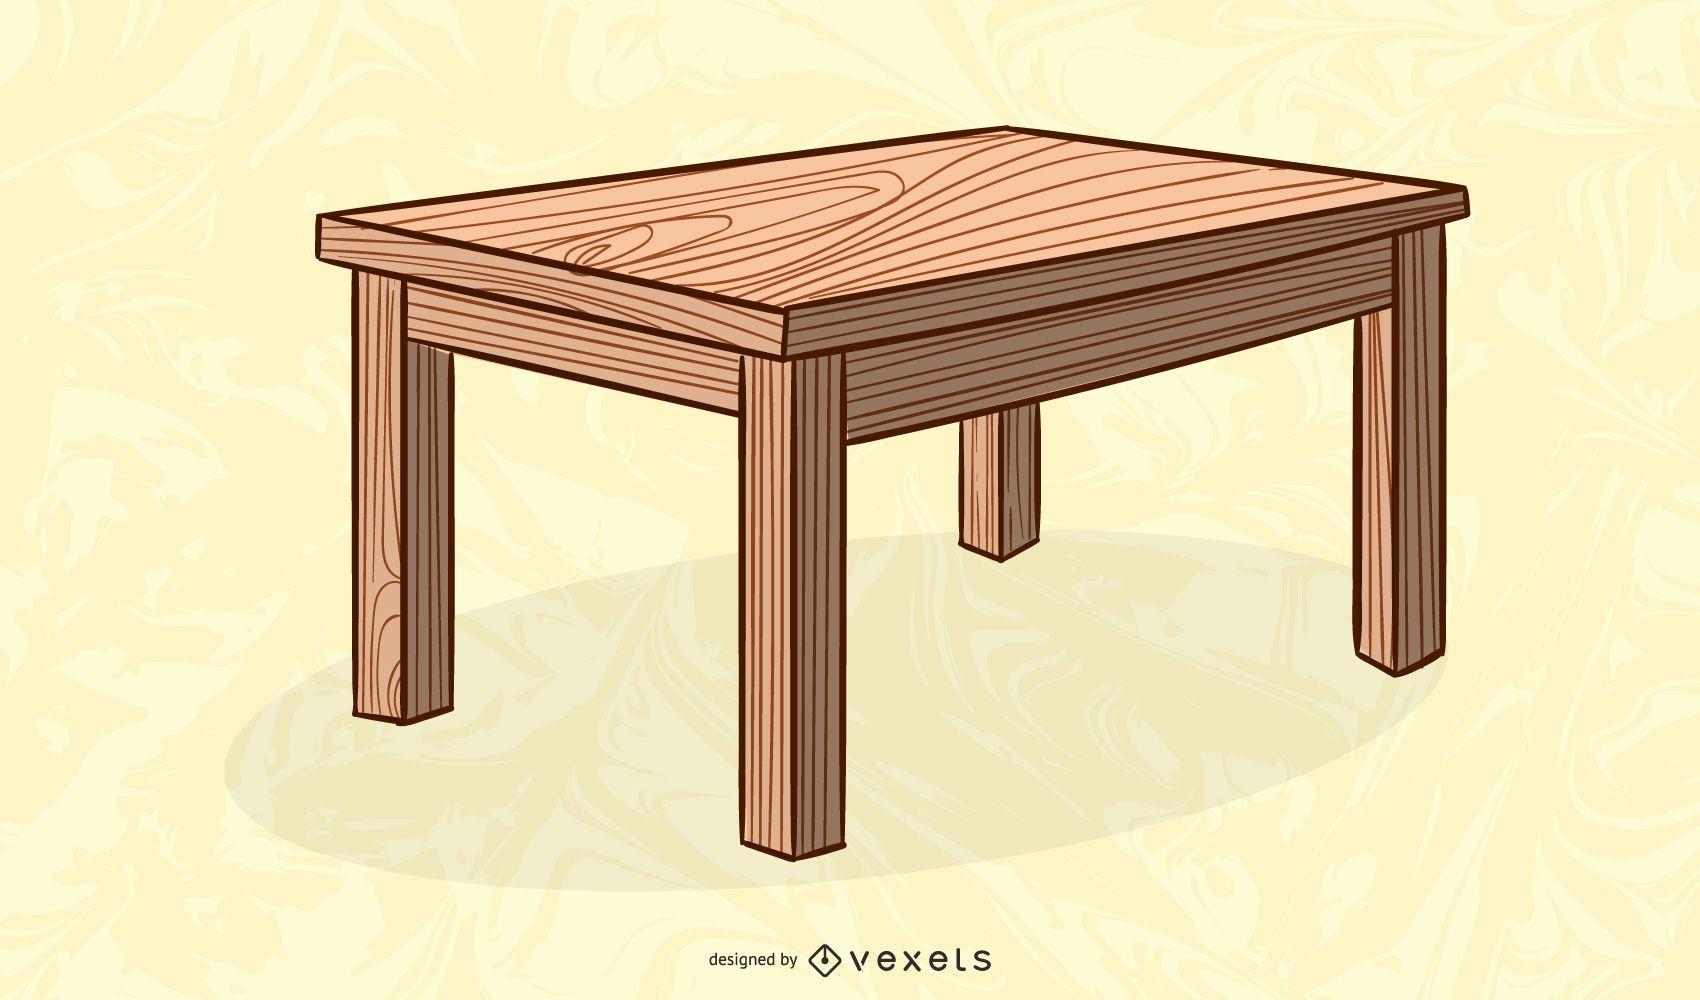 ilustraci?n de mesa de madera rectangular